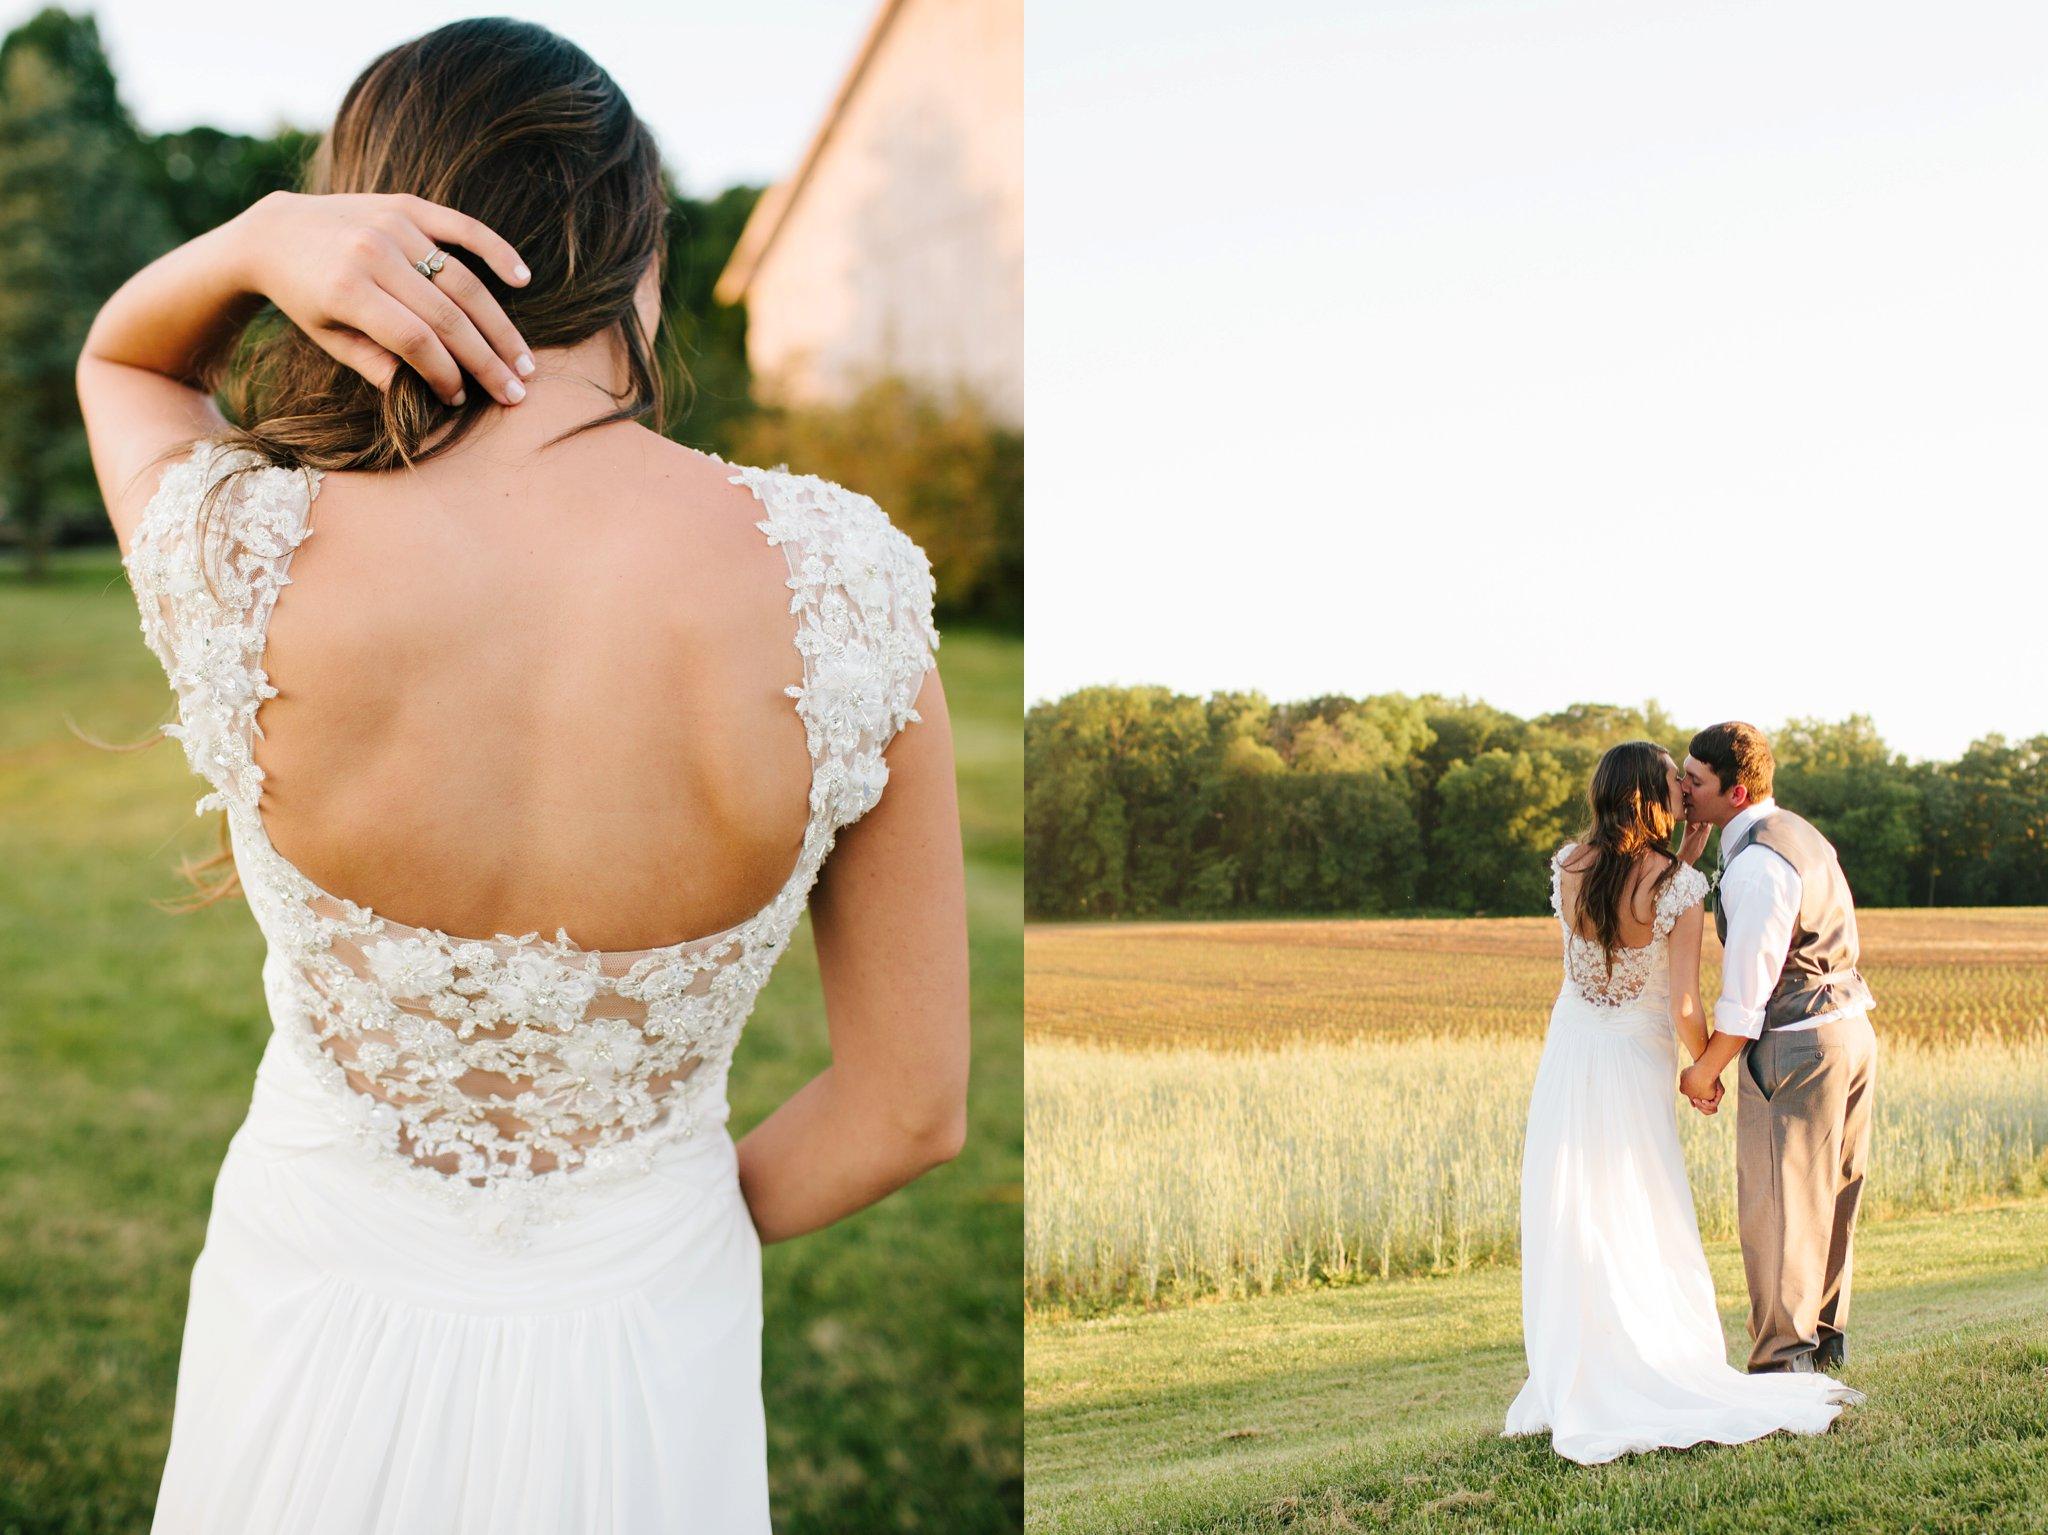 spring hill manor wedding photos rising sun md photographer